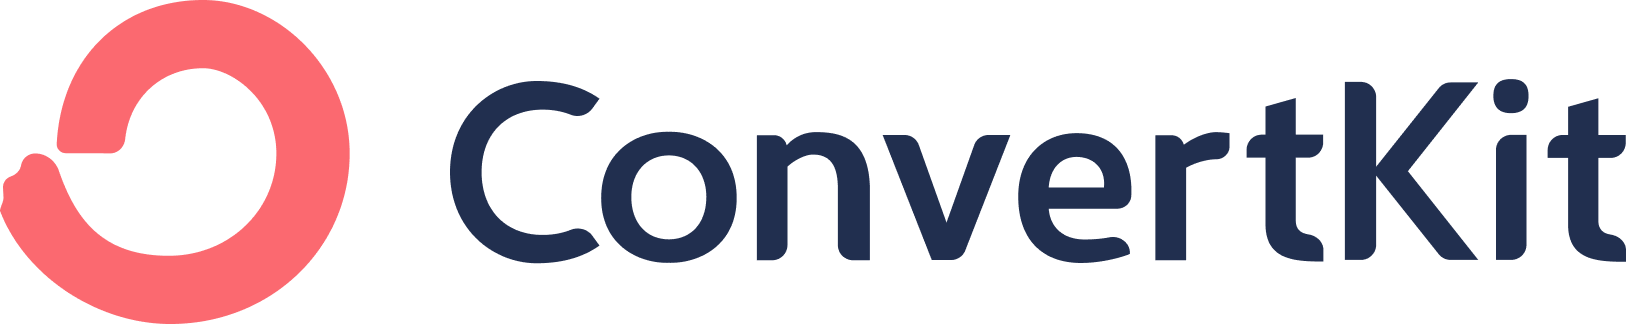 Logo of ConvertKit